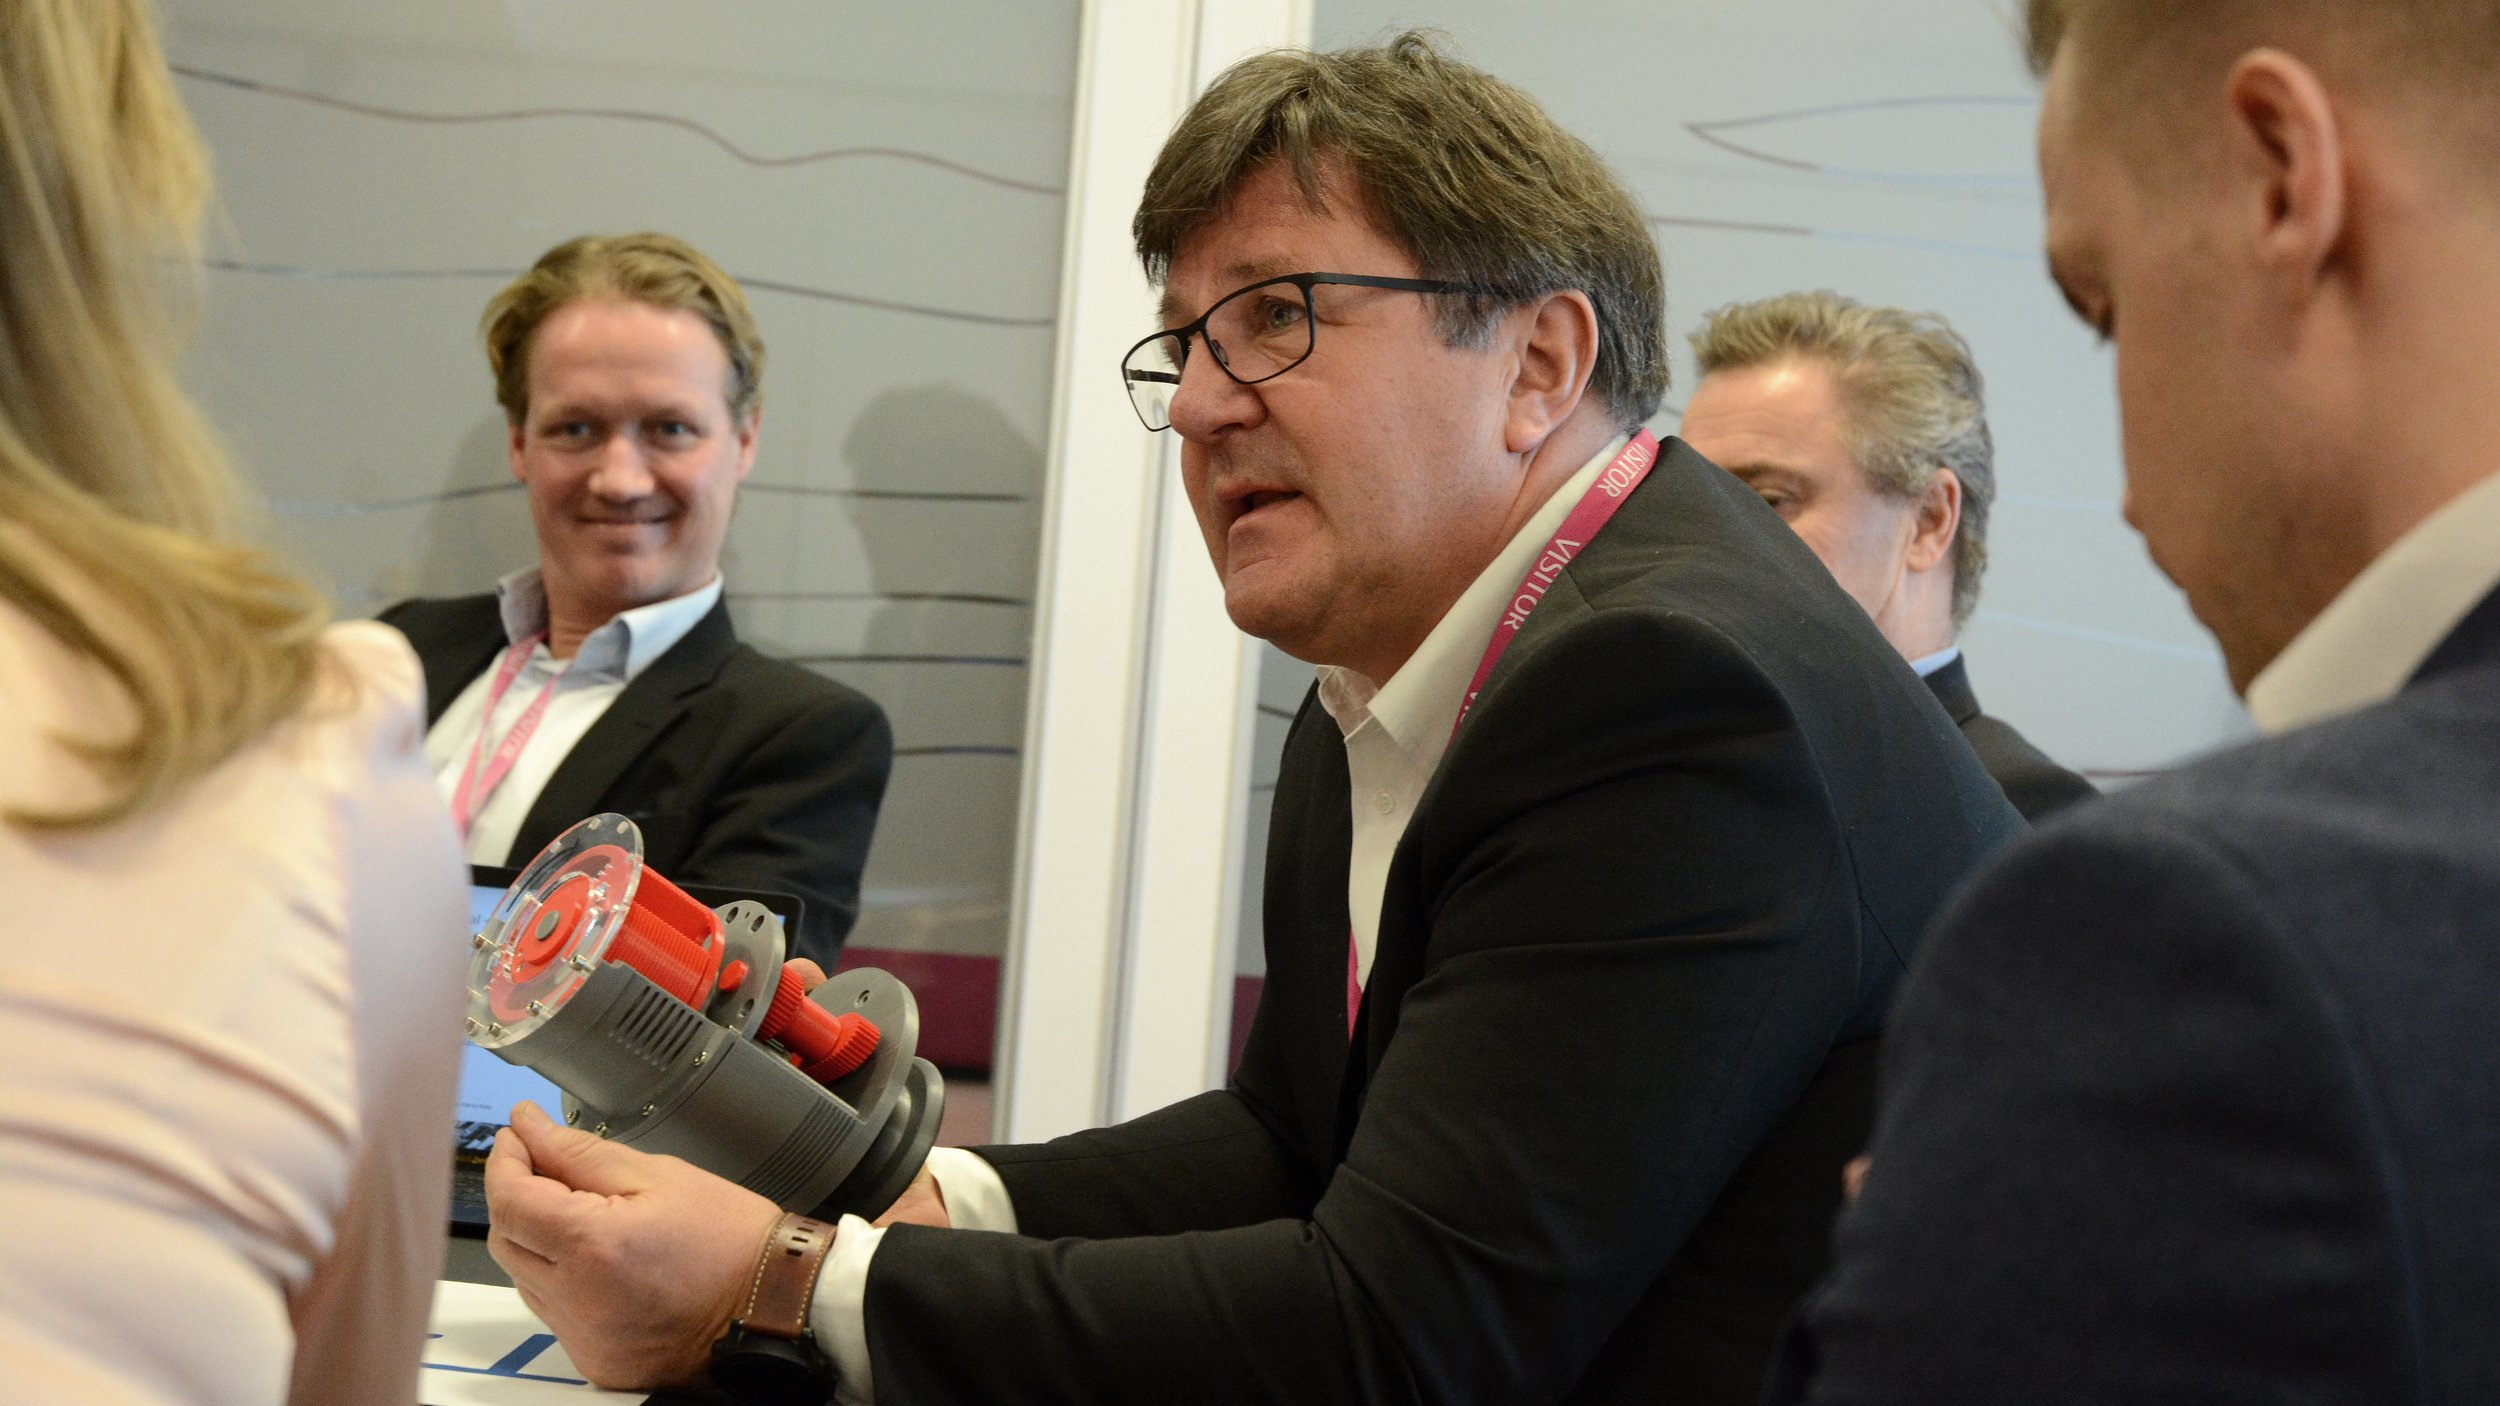 Tor Arne Hauge presenterer teknologien til OTECHOS, som kan brukes både som pumpe, kompressor, forbrenningsmotor og varmegjenvinner.  Foto: Ina Steen Andersen   www.tu.no